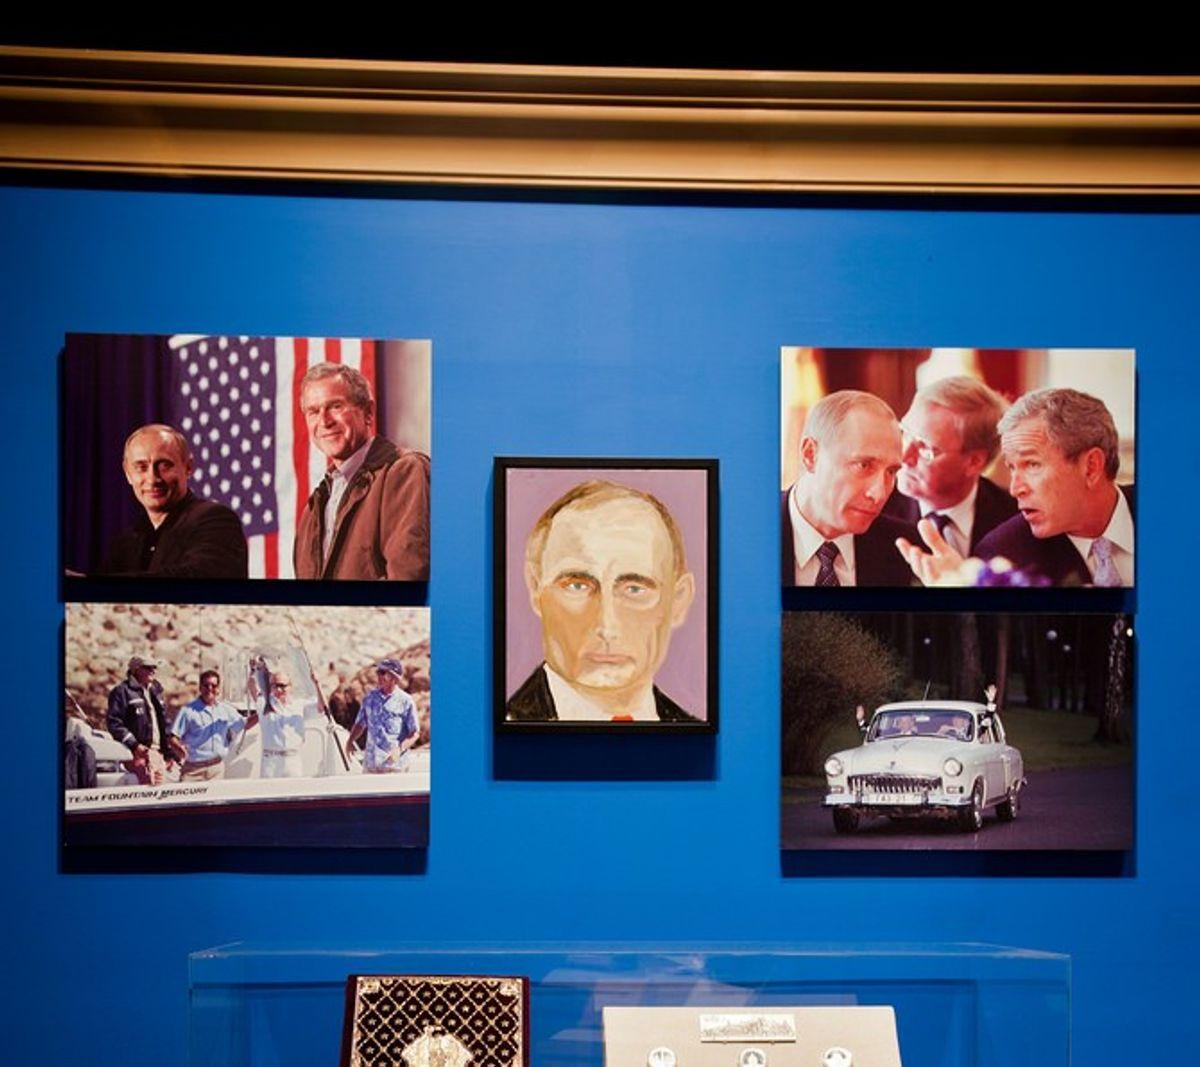 (Kim Leeson/George W. Bush Presidential Center via Flickr)